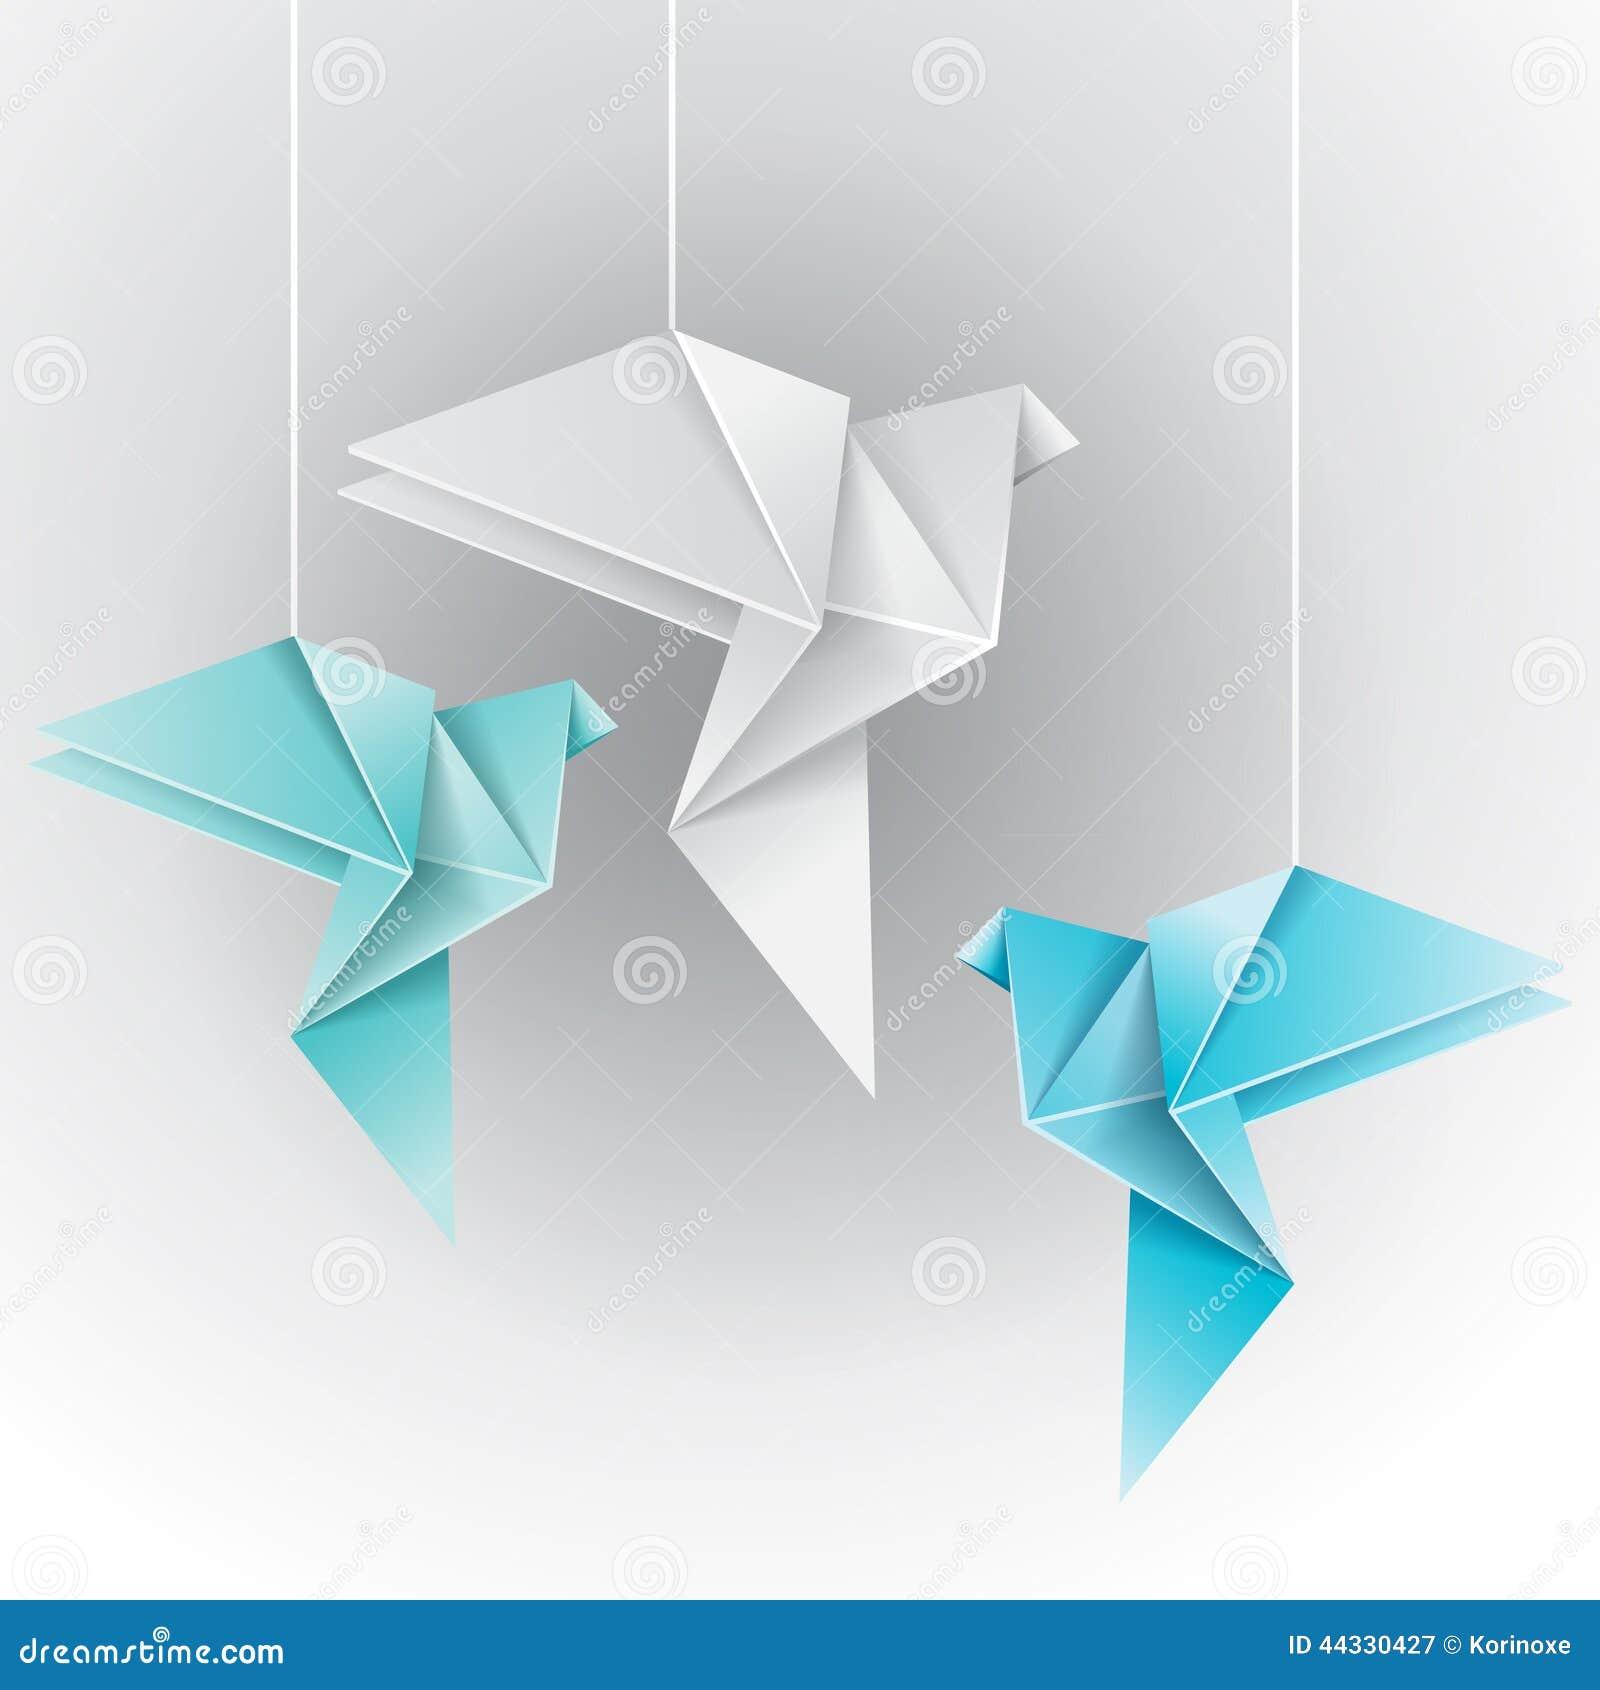 Origami Different Color Dove Stock Vector - Image: 44330427 - photo#38